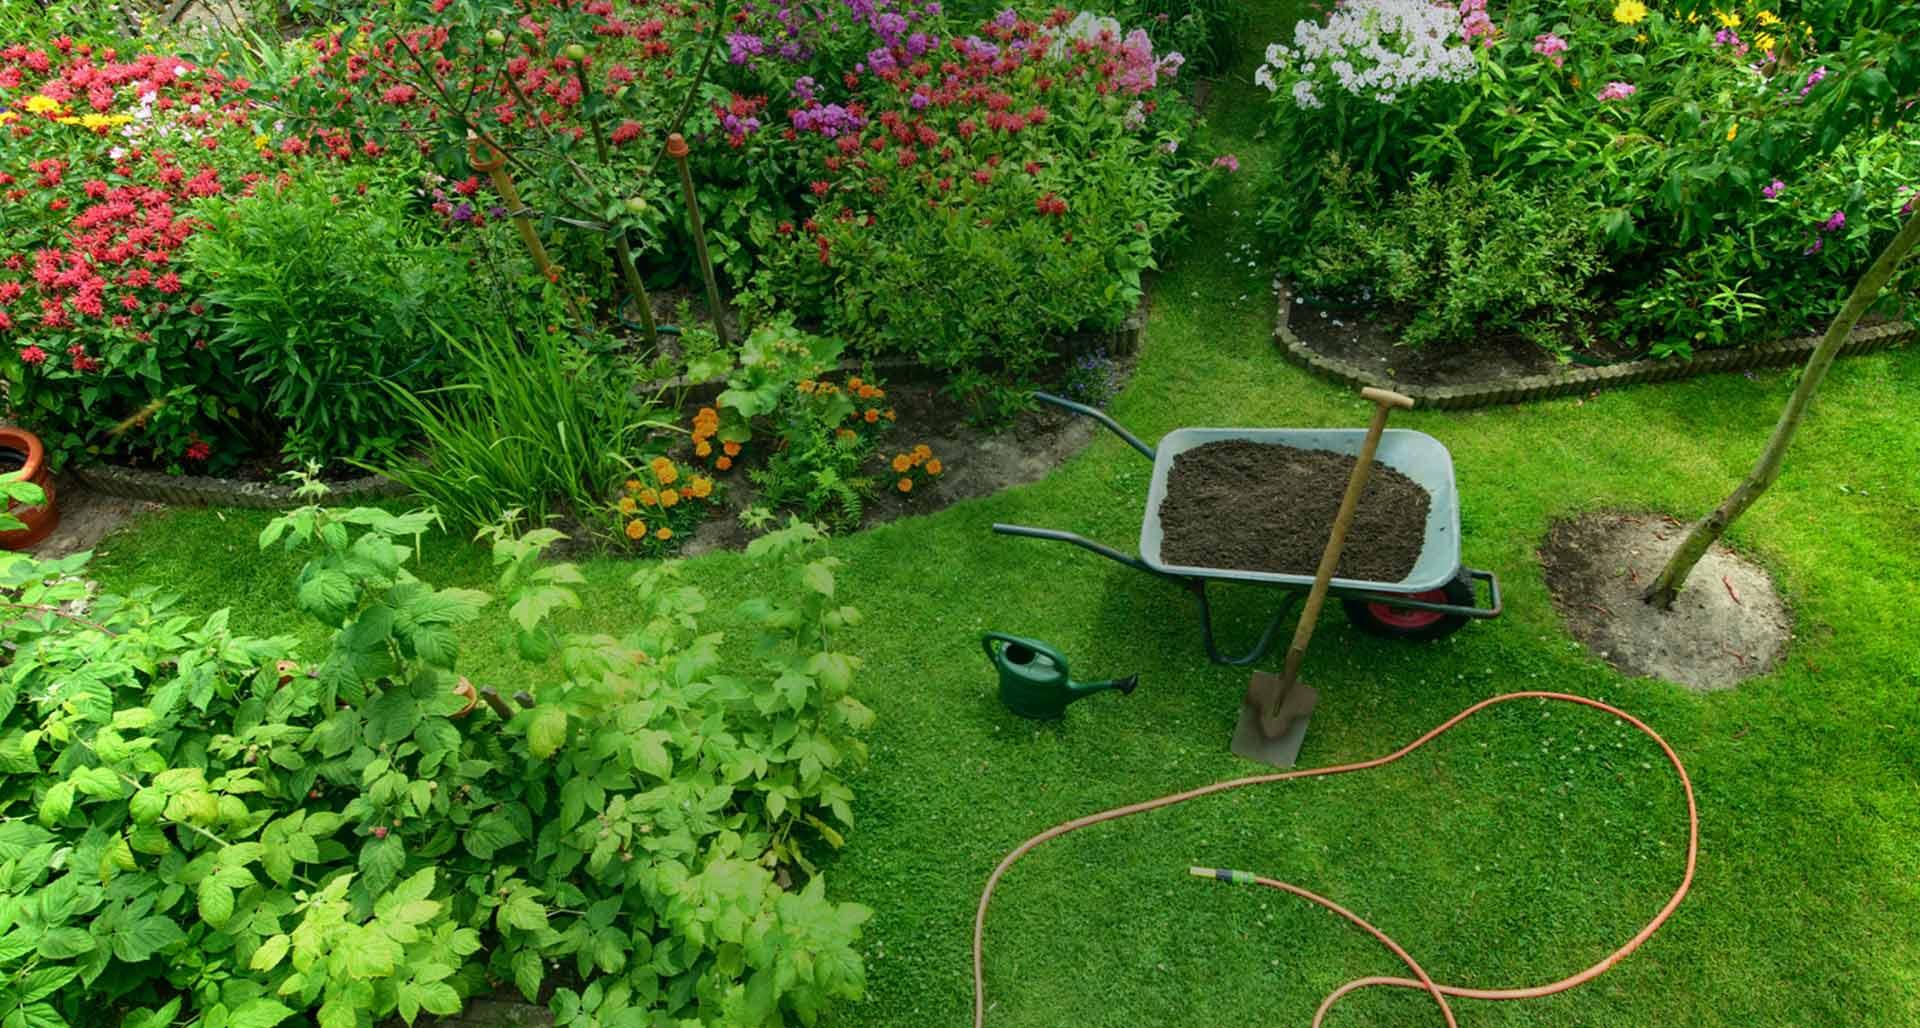 Jardineries Truffaut : Spécialiste Jardin, Animaux, Maison ... tout Petit Jardin Avec Bassin